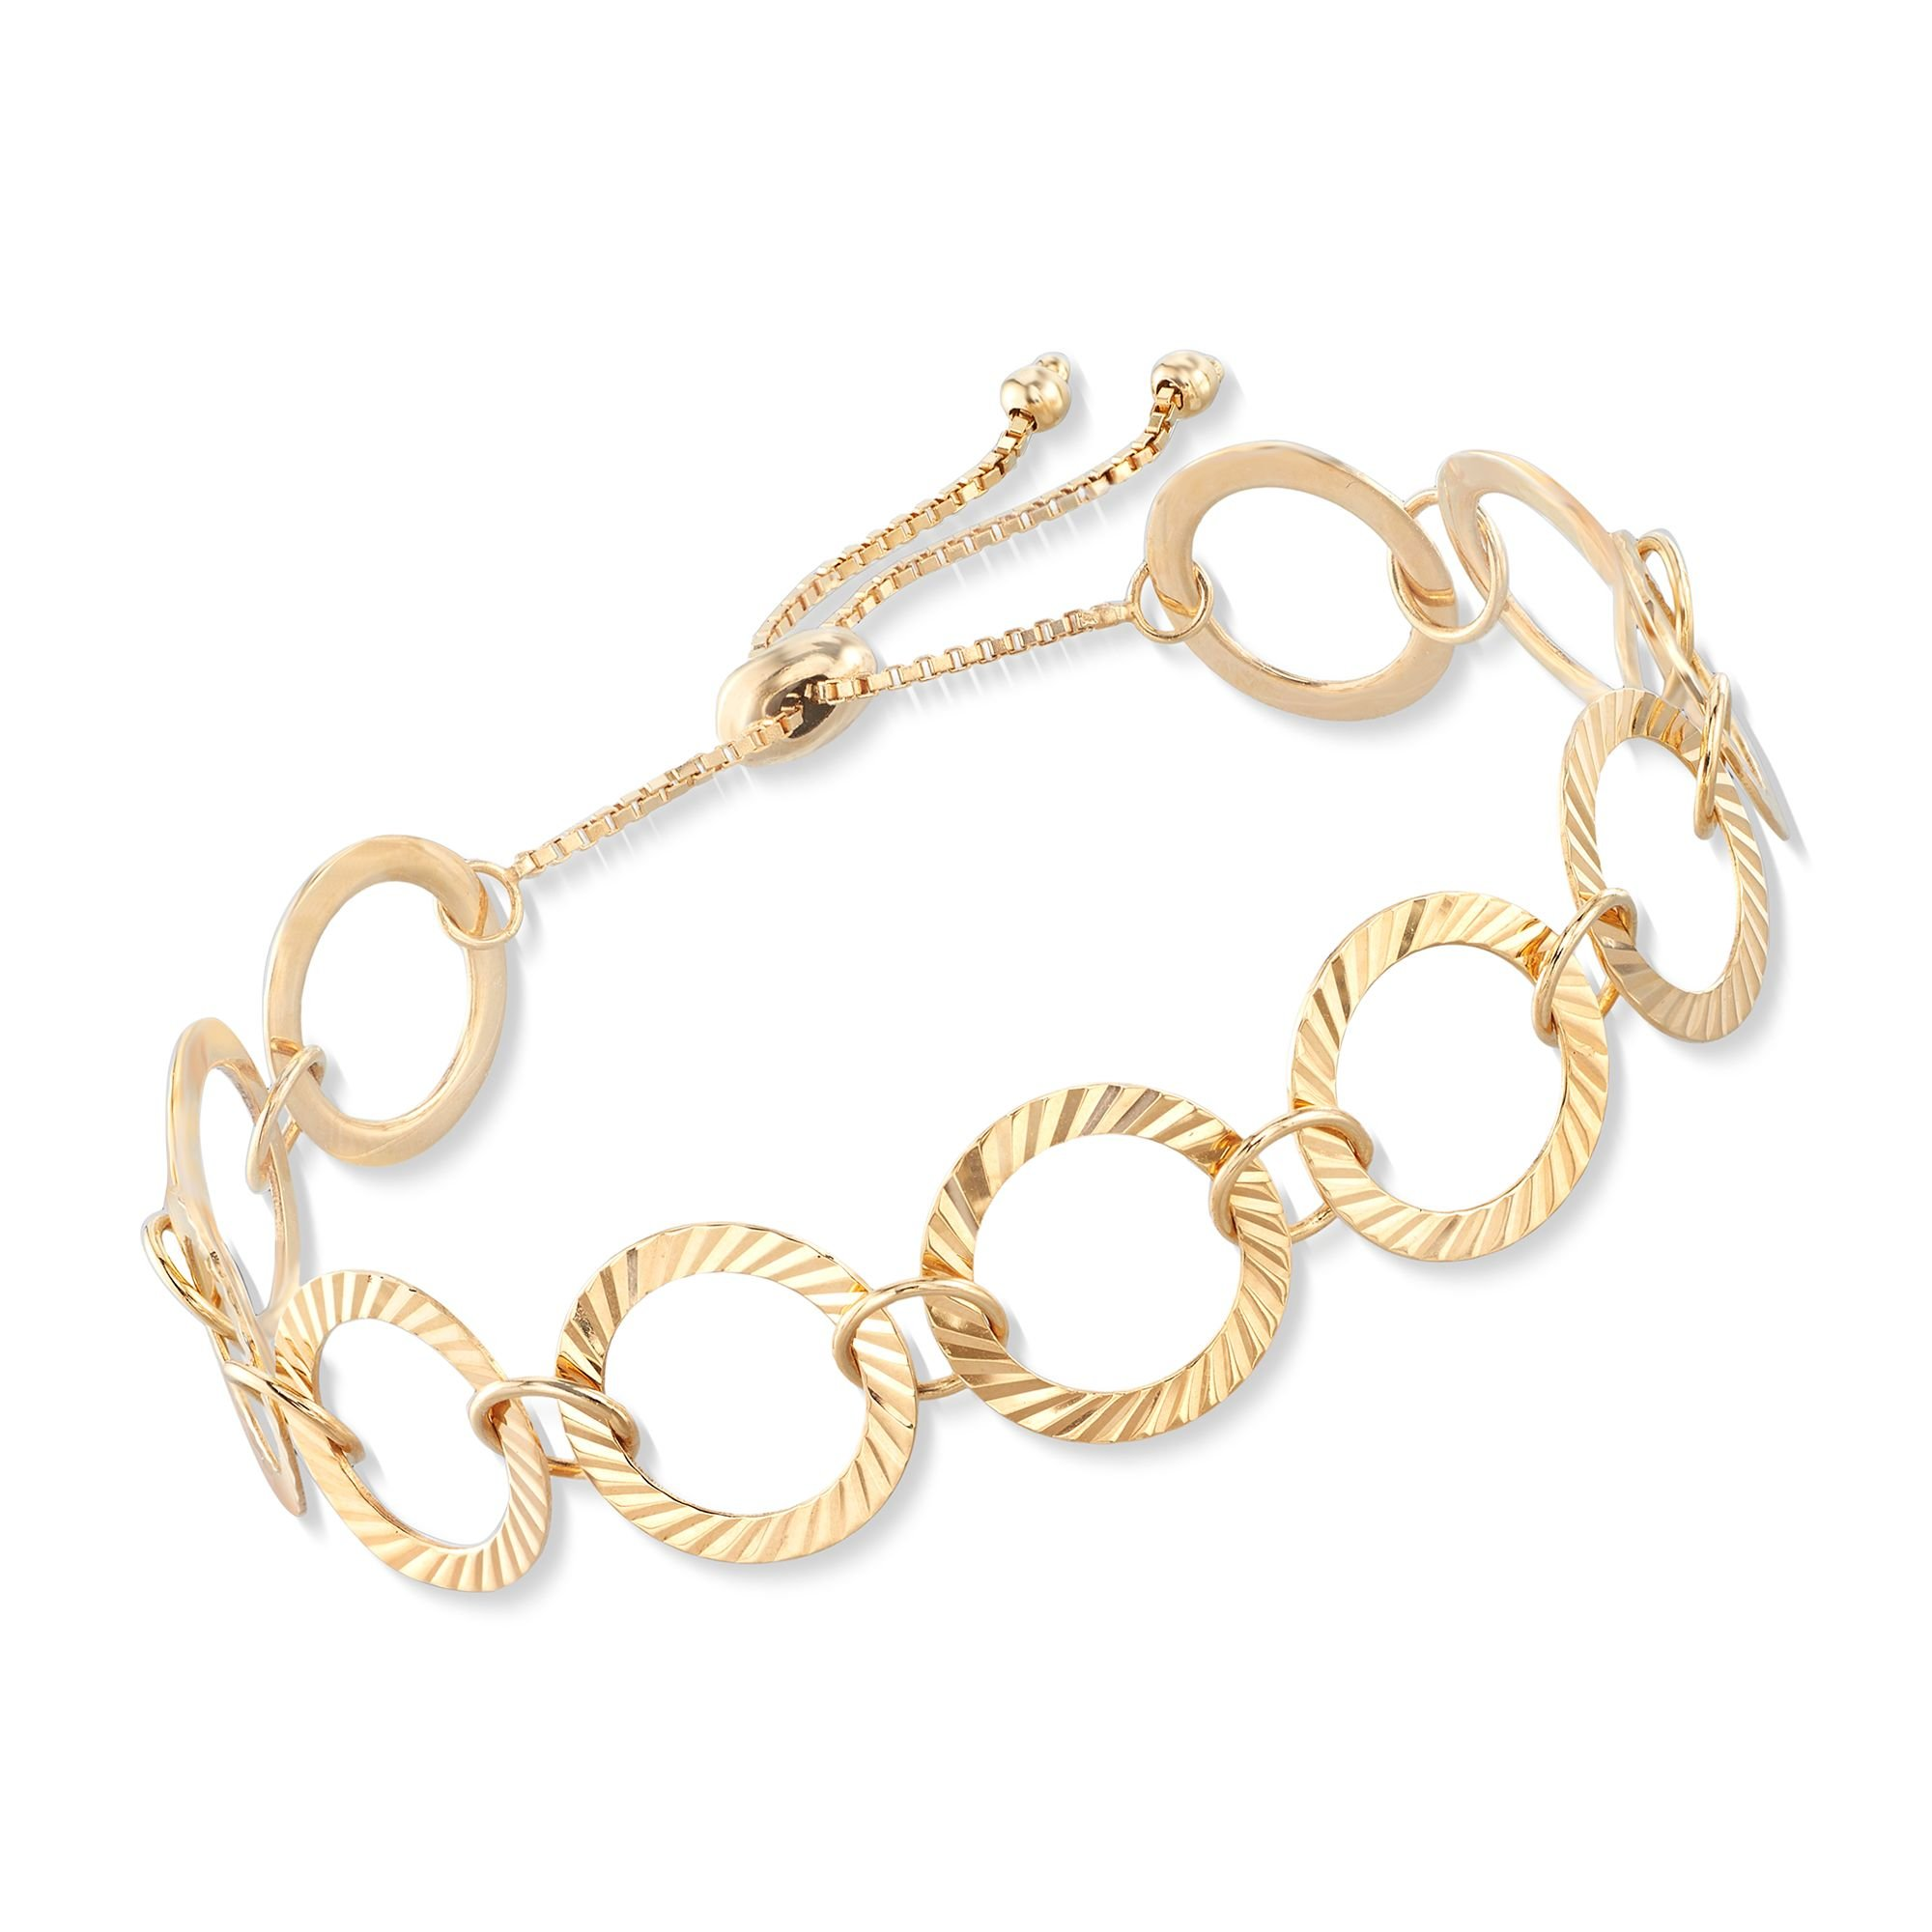 Ross-Simons 18kt Gold Over Sterling Silver Crimped Circle-Link Bolo Bracelet